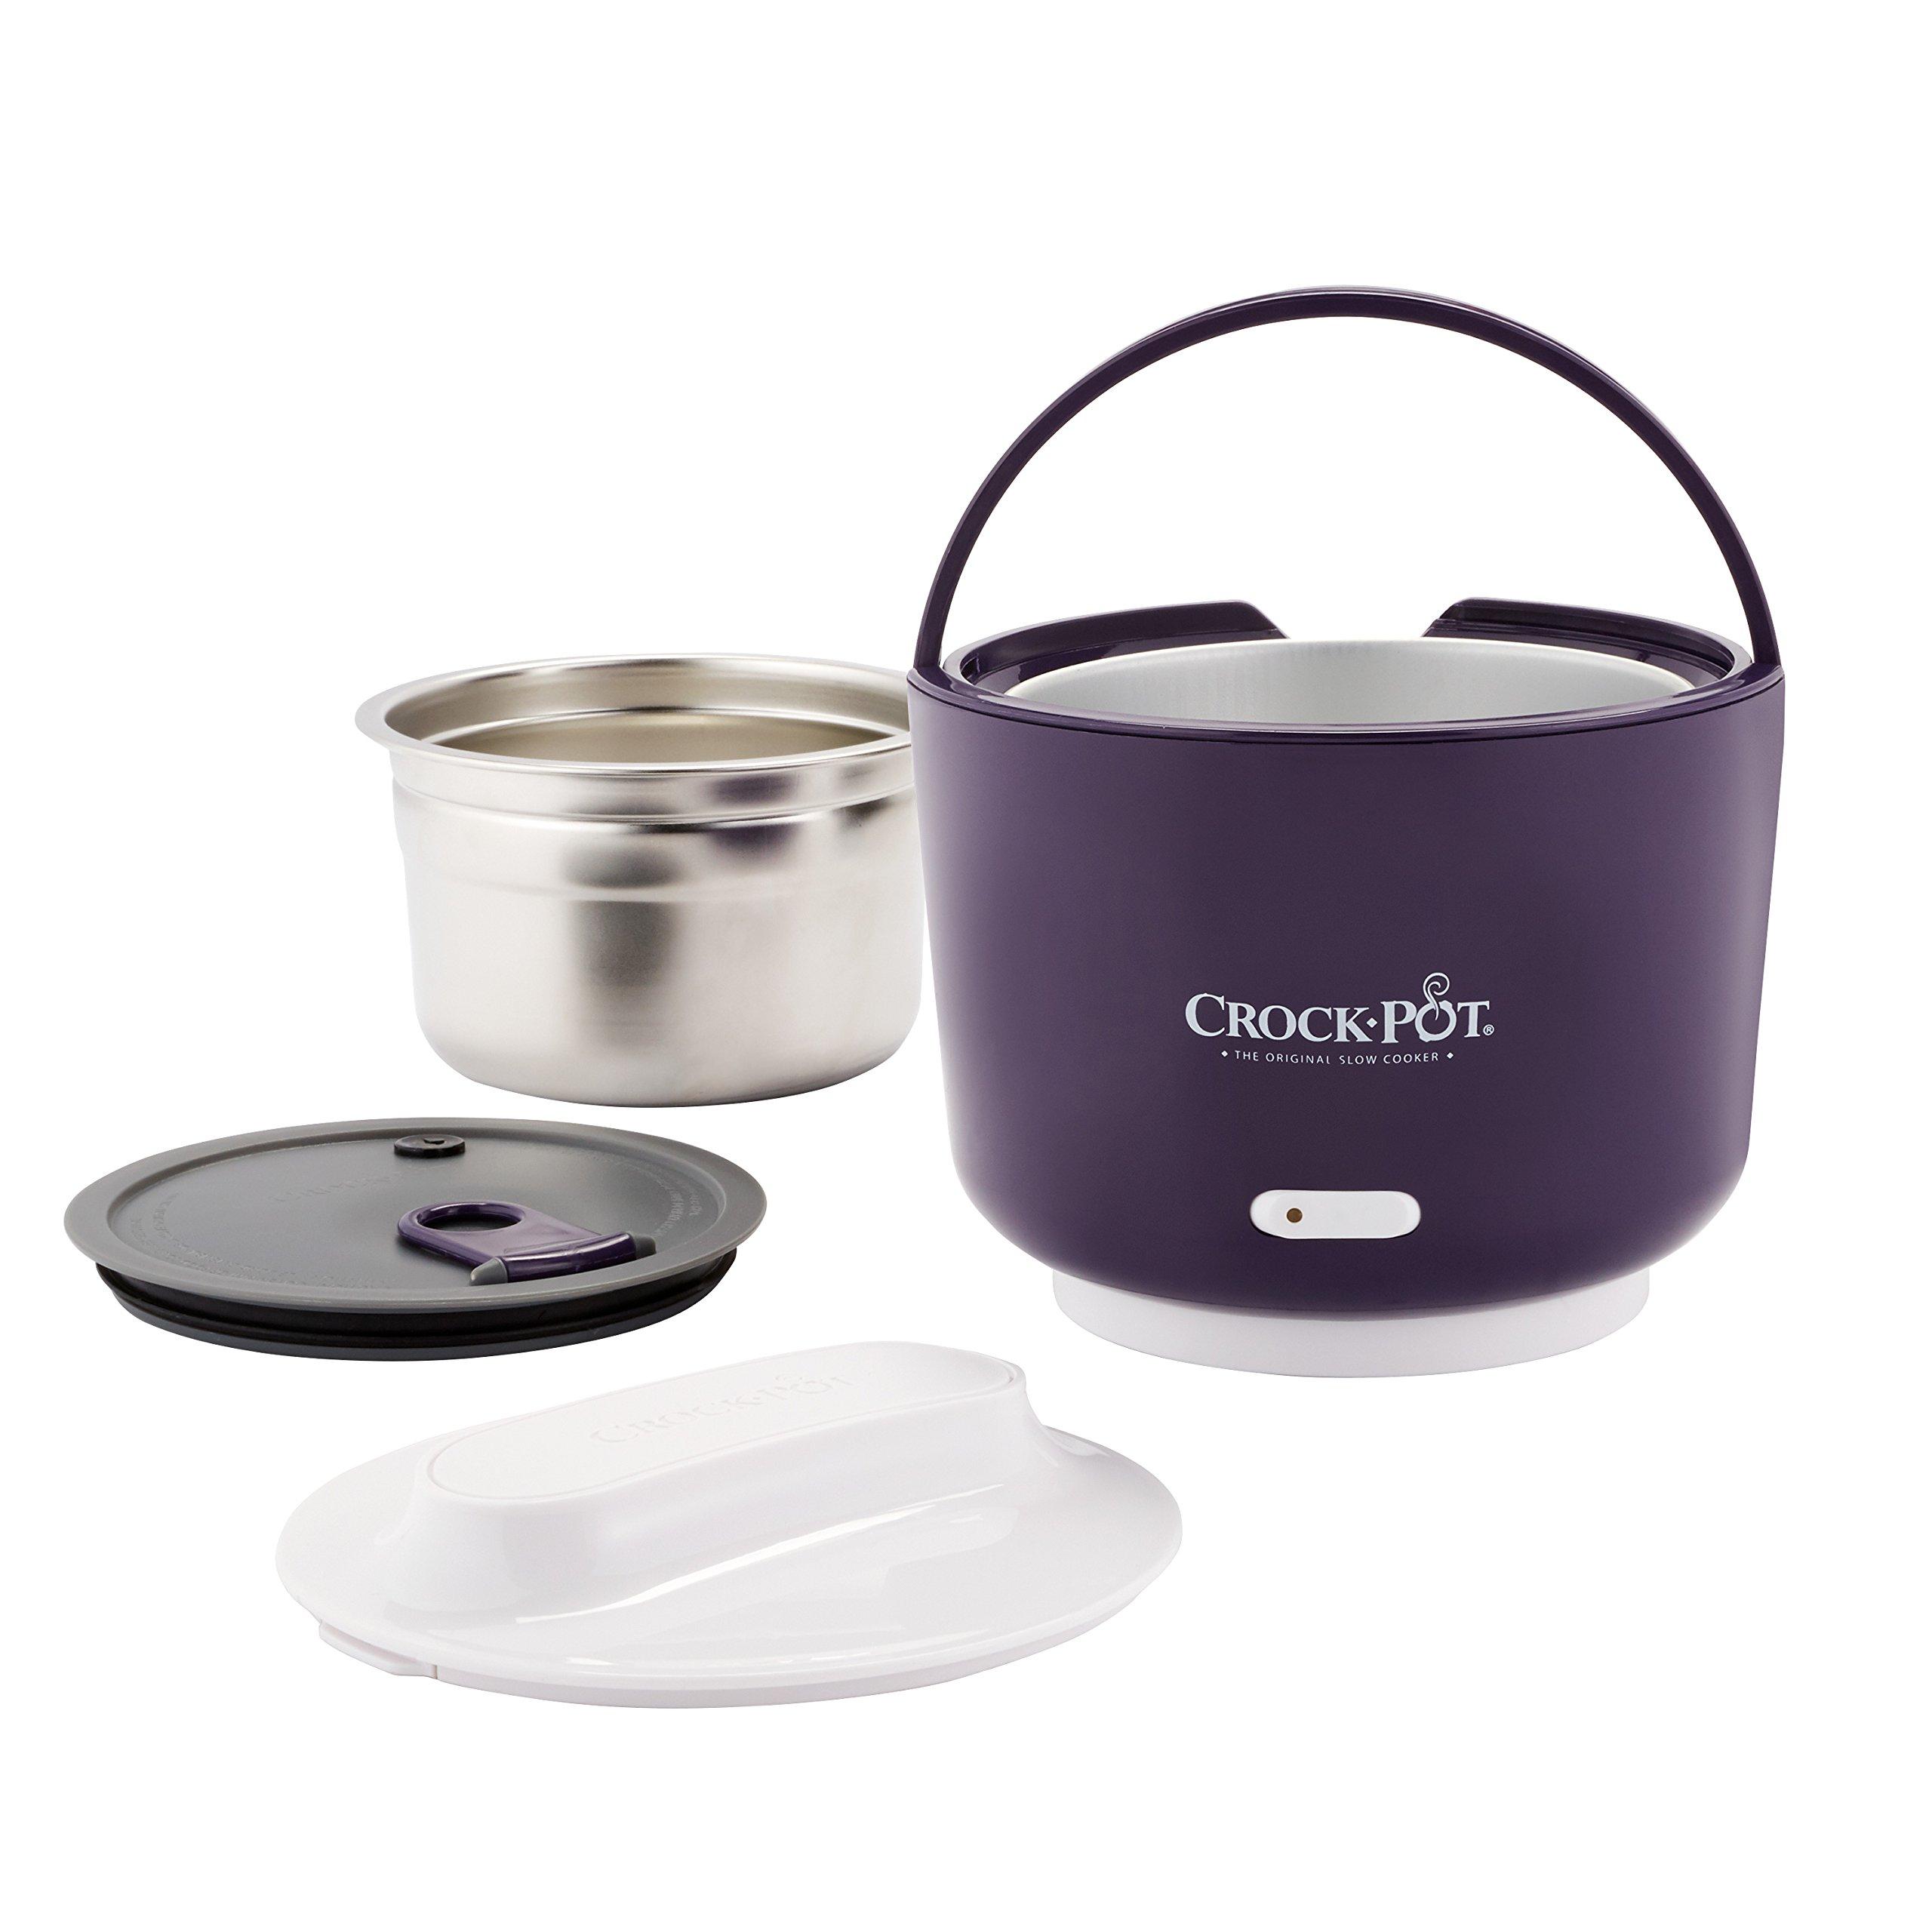 Crock-Pot 24-Ounce Lunch Crock Food Warmer, Deluxe Edition, Purple by Crock-Pot (Image #3)